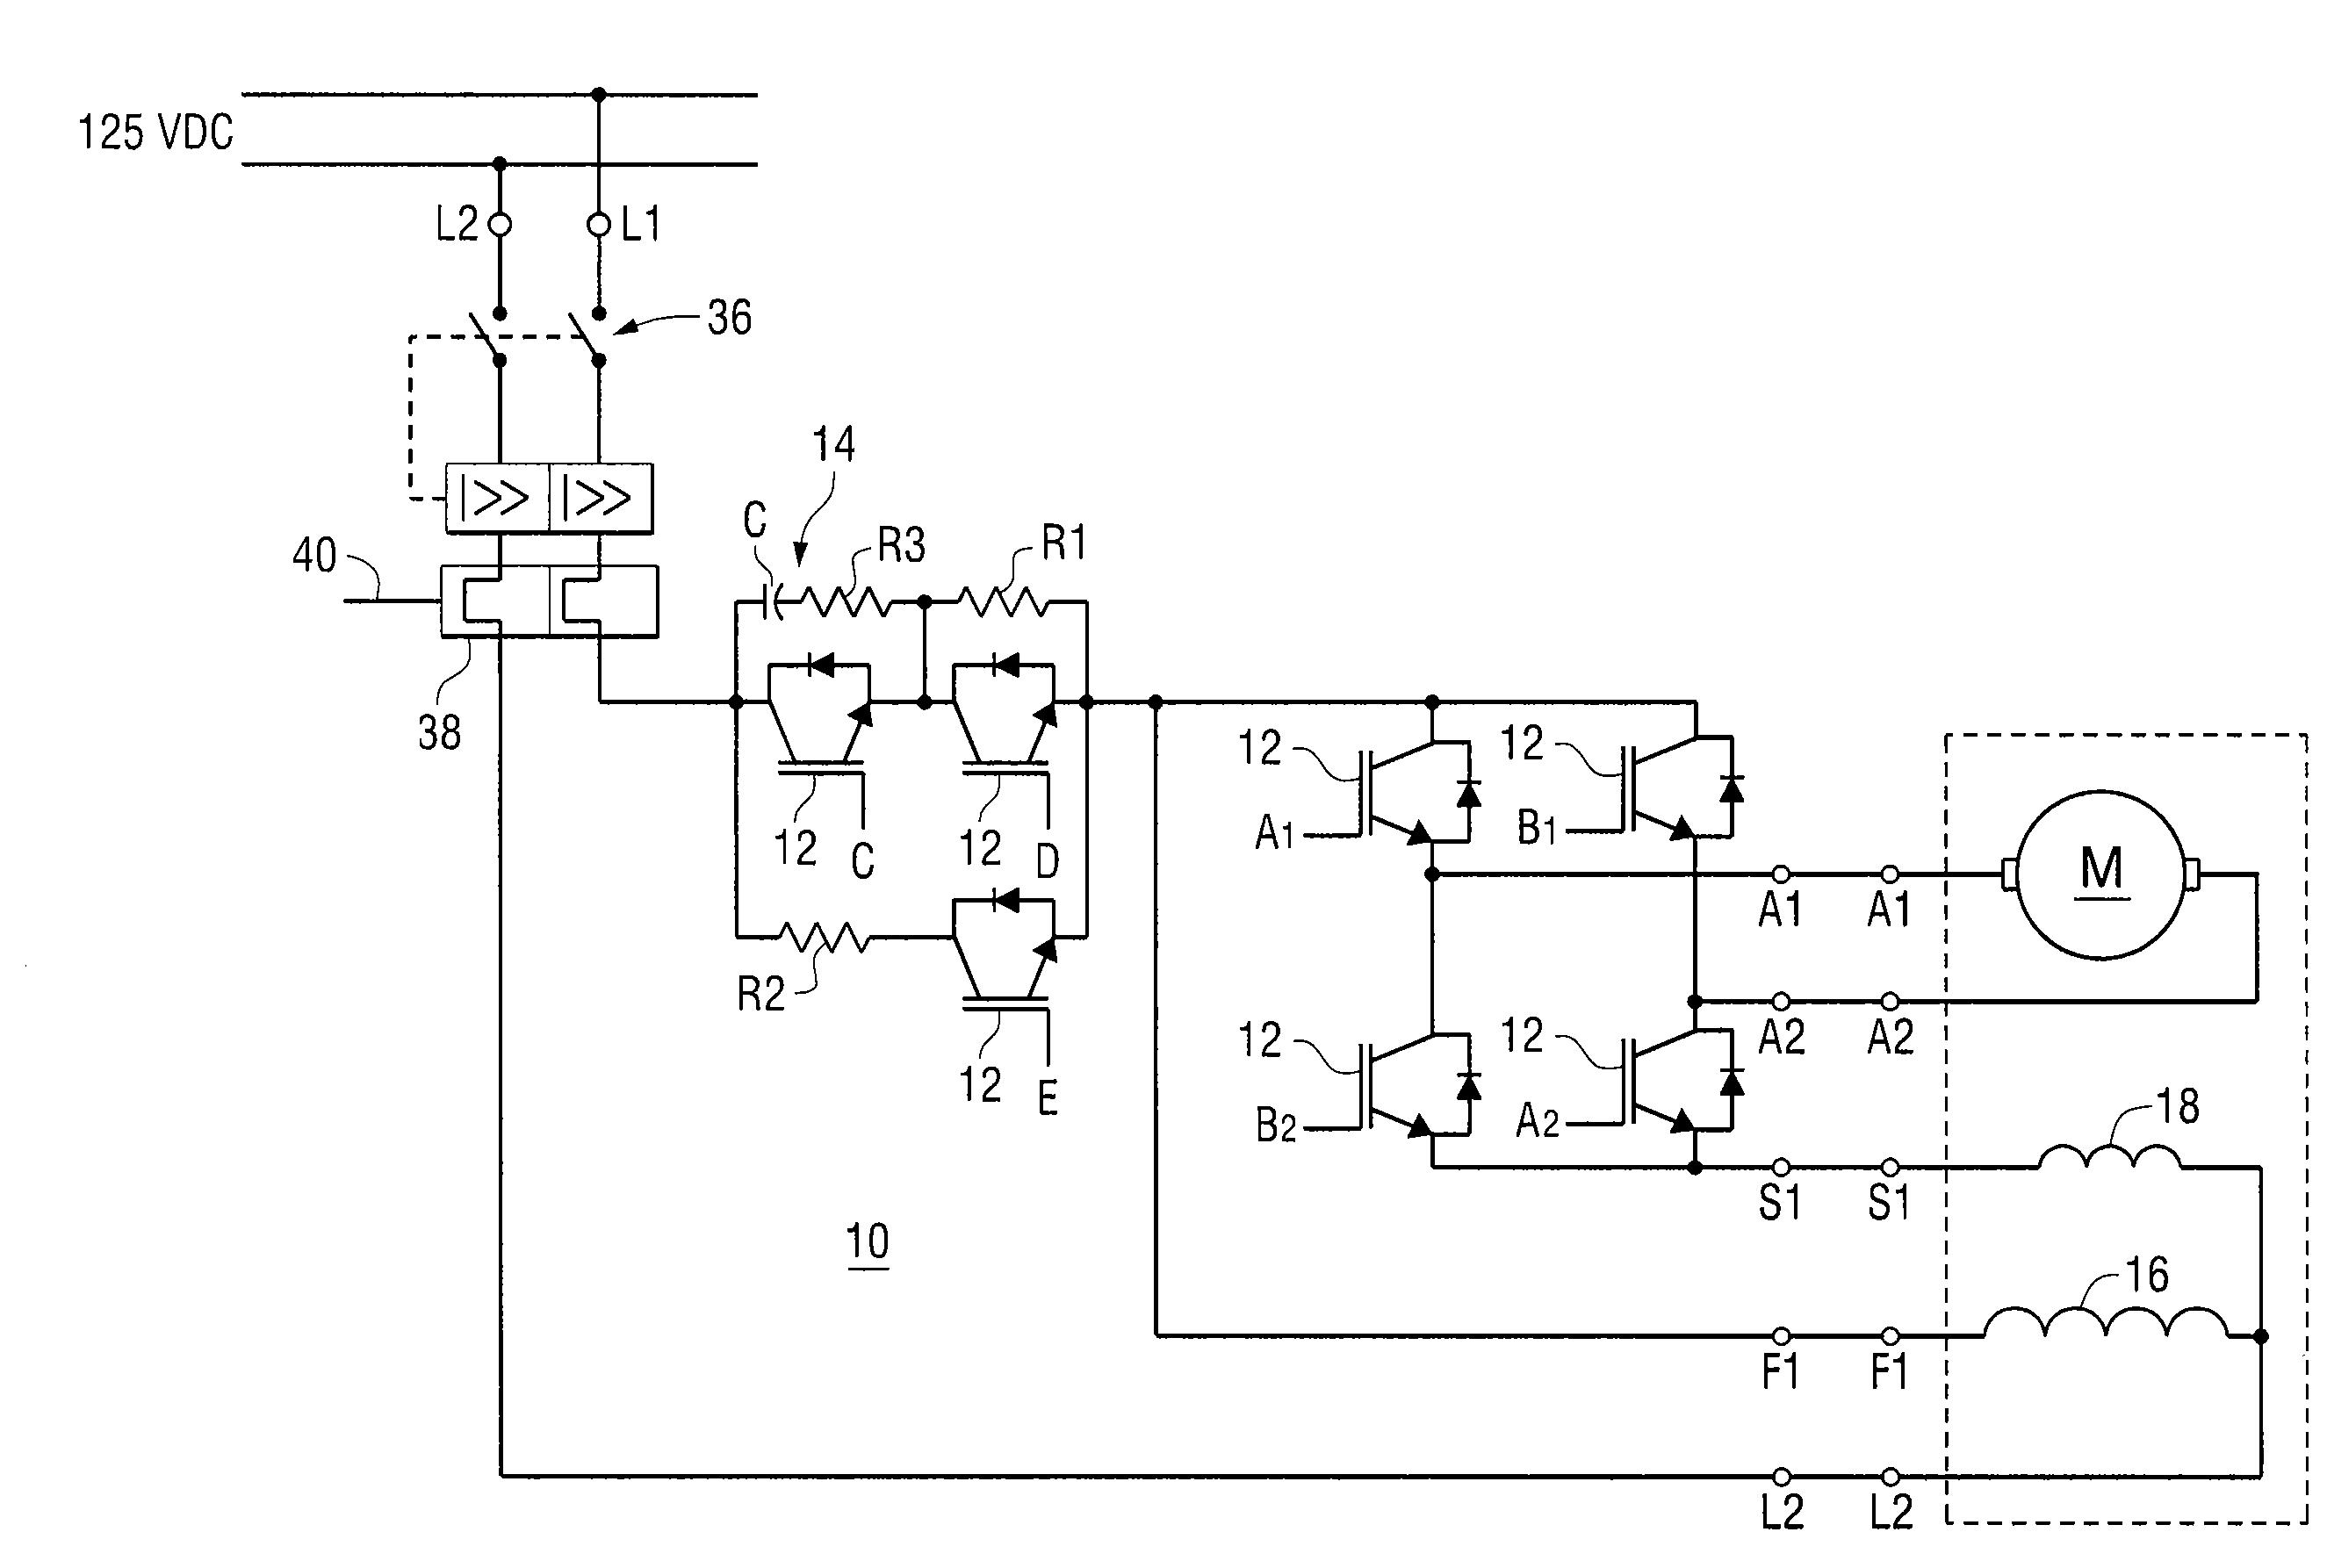 allen bradley reversing motor starter wiring diagram fender squier strat www toyskids co patent us7397222 on line testable solid state with